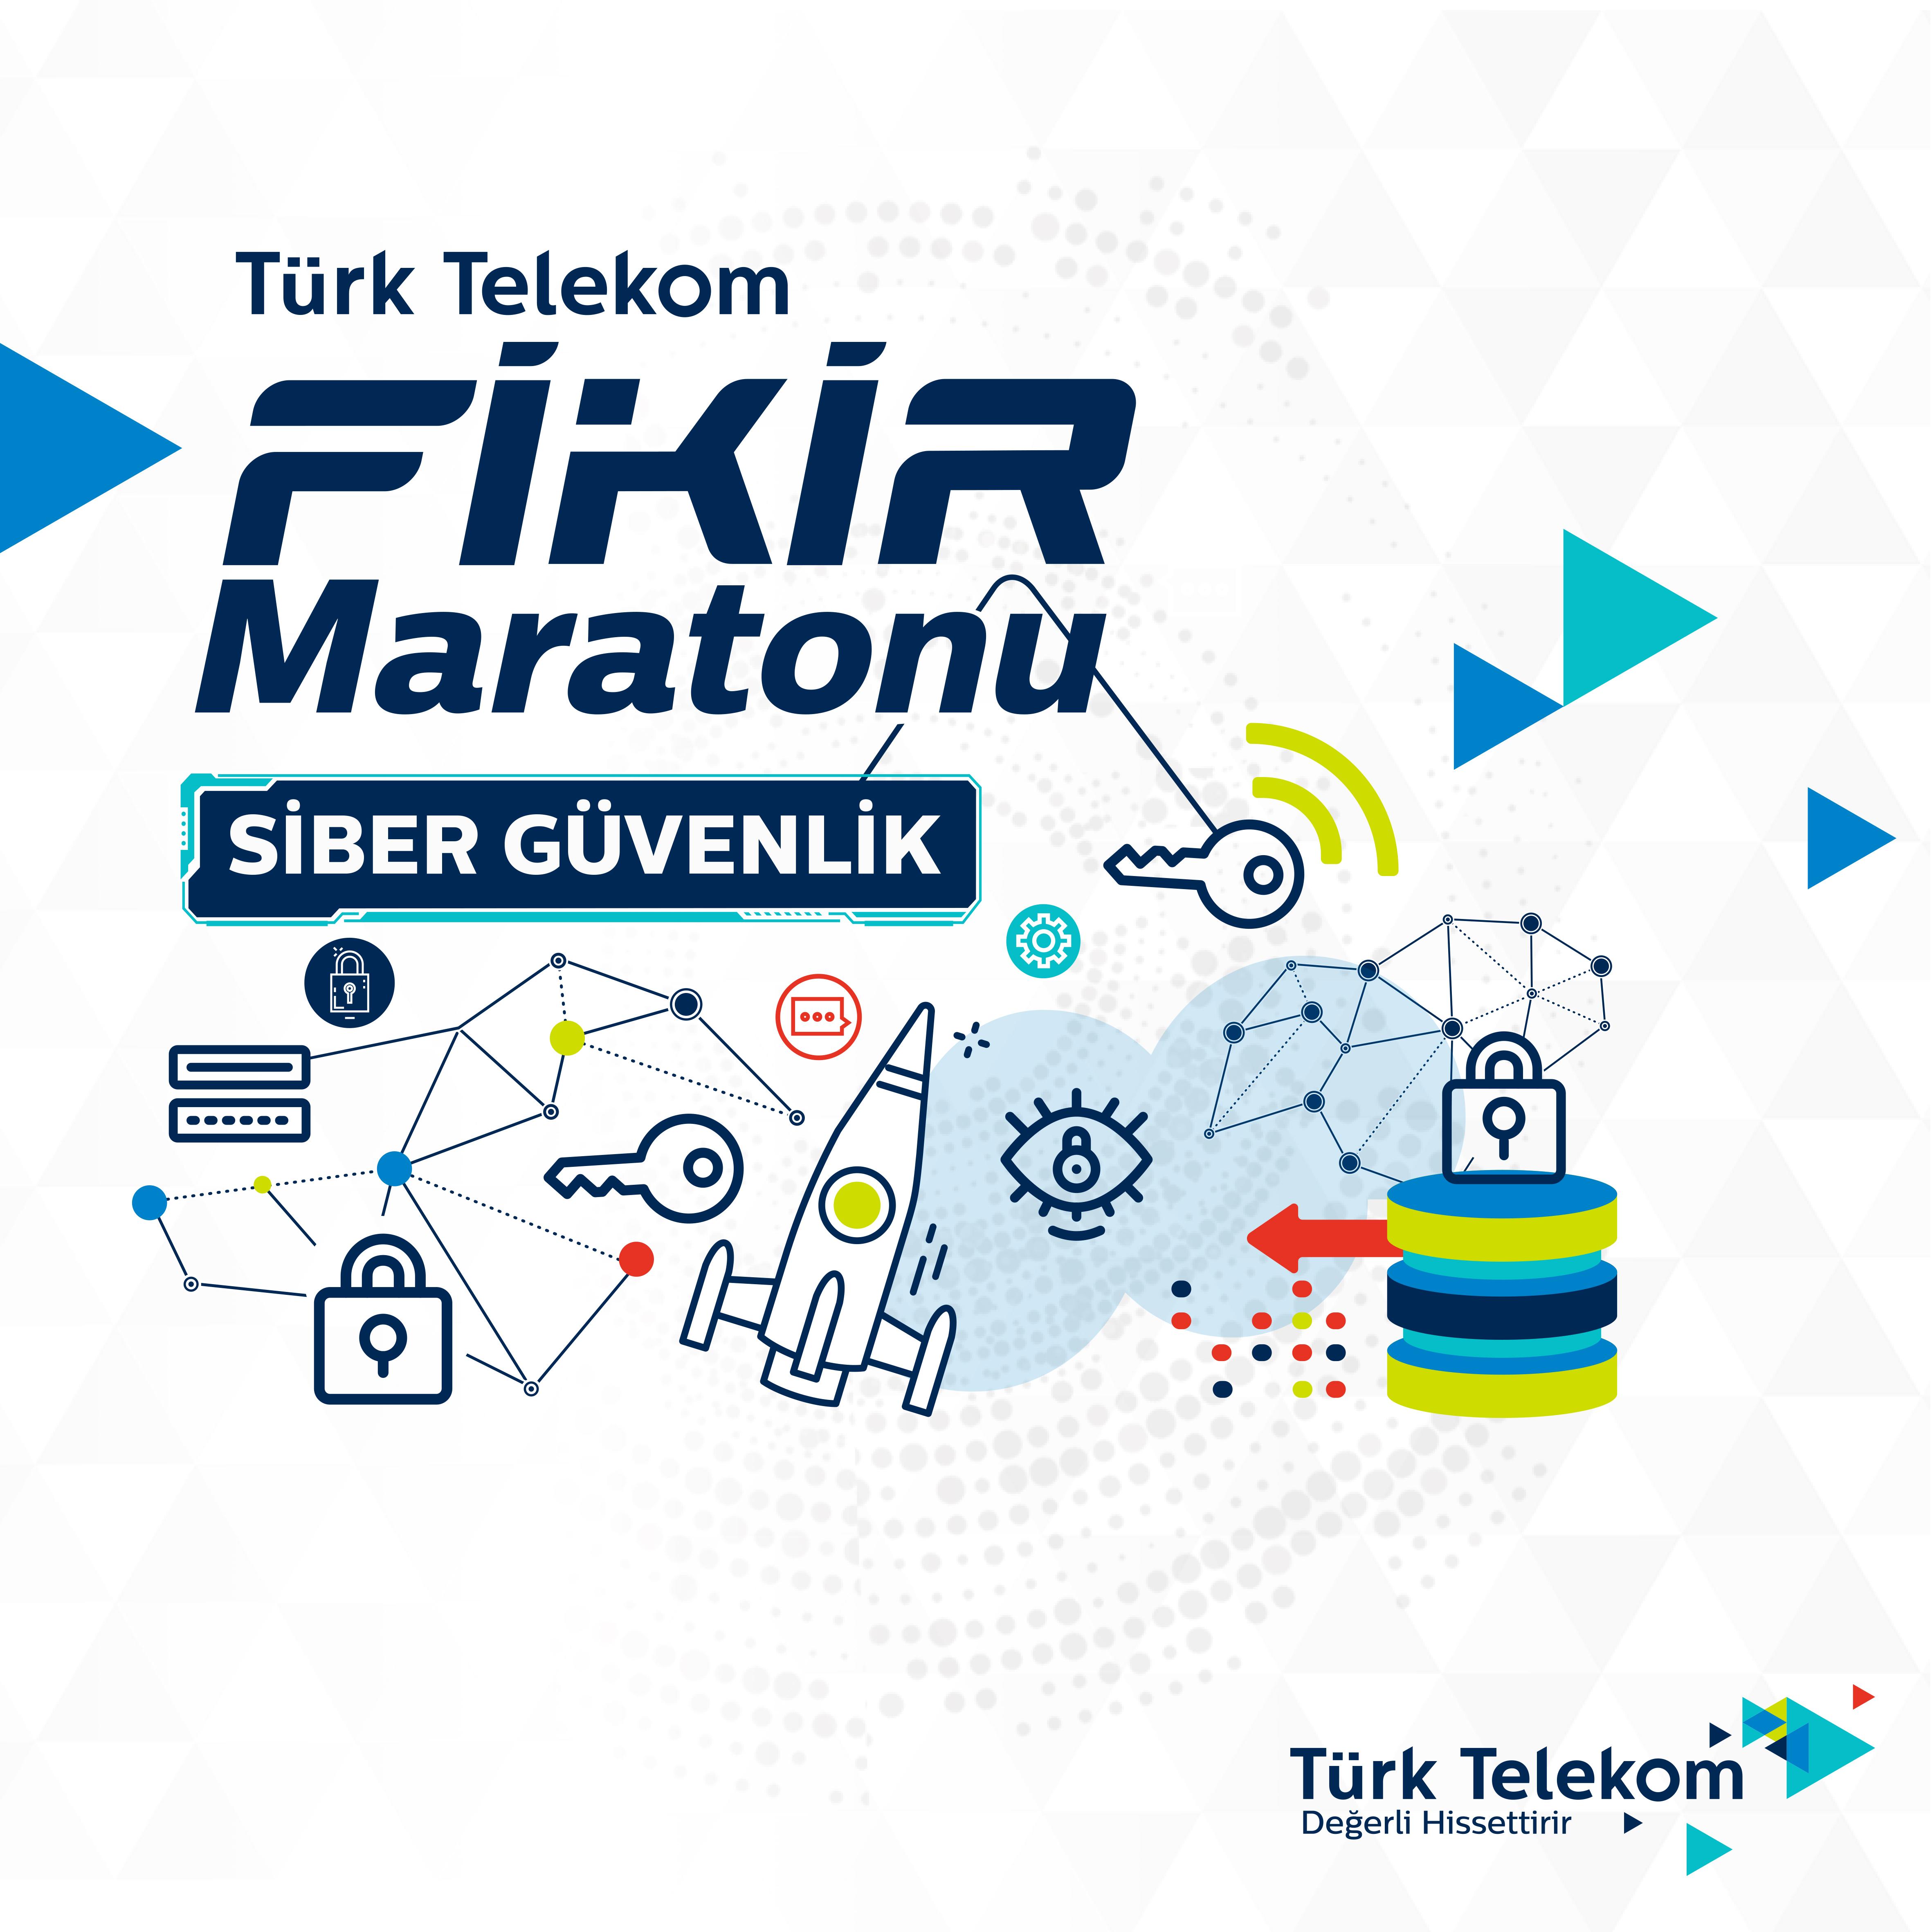 Türk Telekom'dan 'Fikir Maratonu'